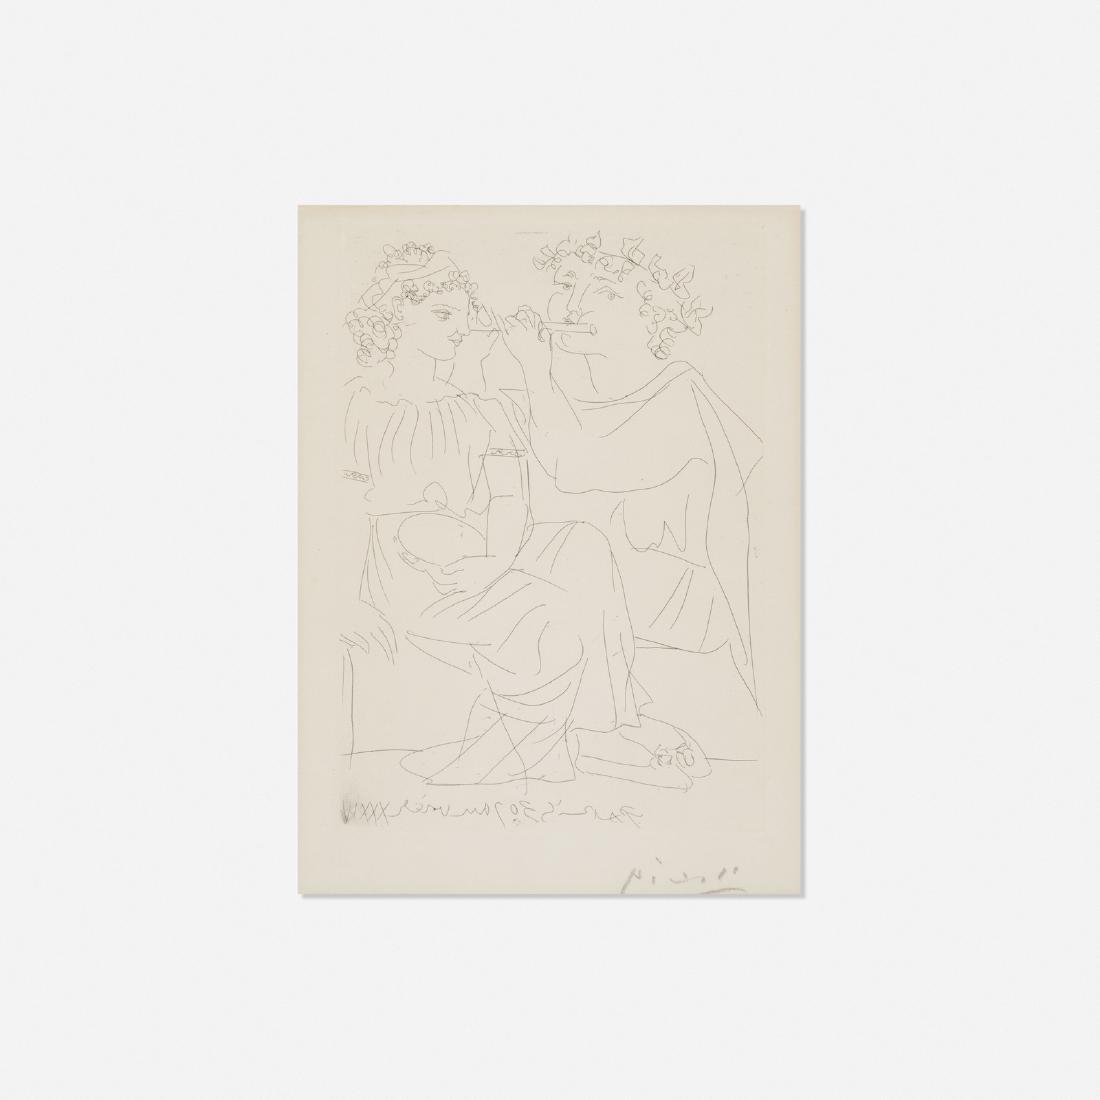 Pablo Picasso, Flutiste et Jeune Fille au Tambourin